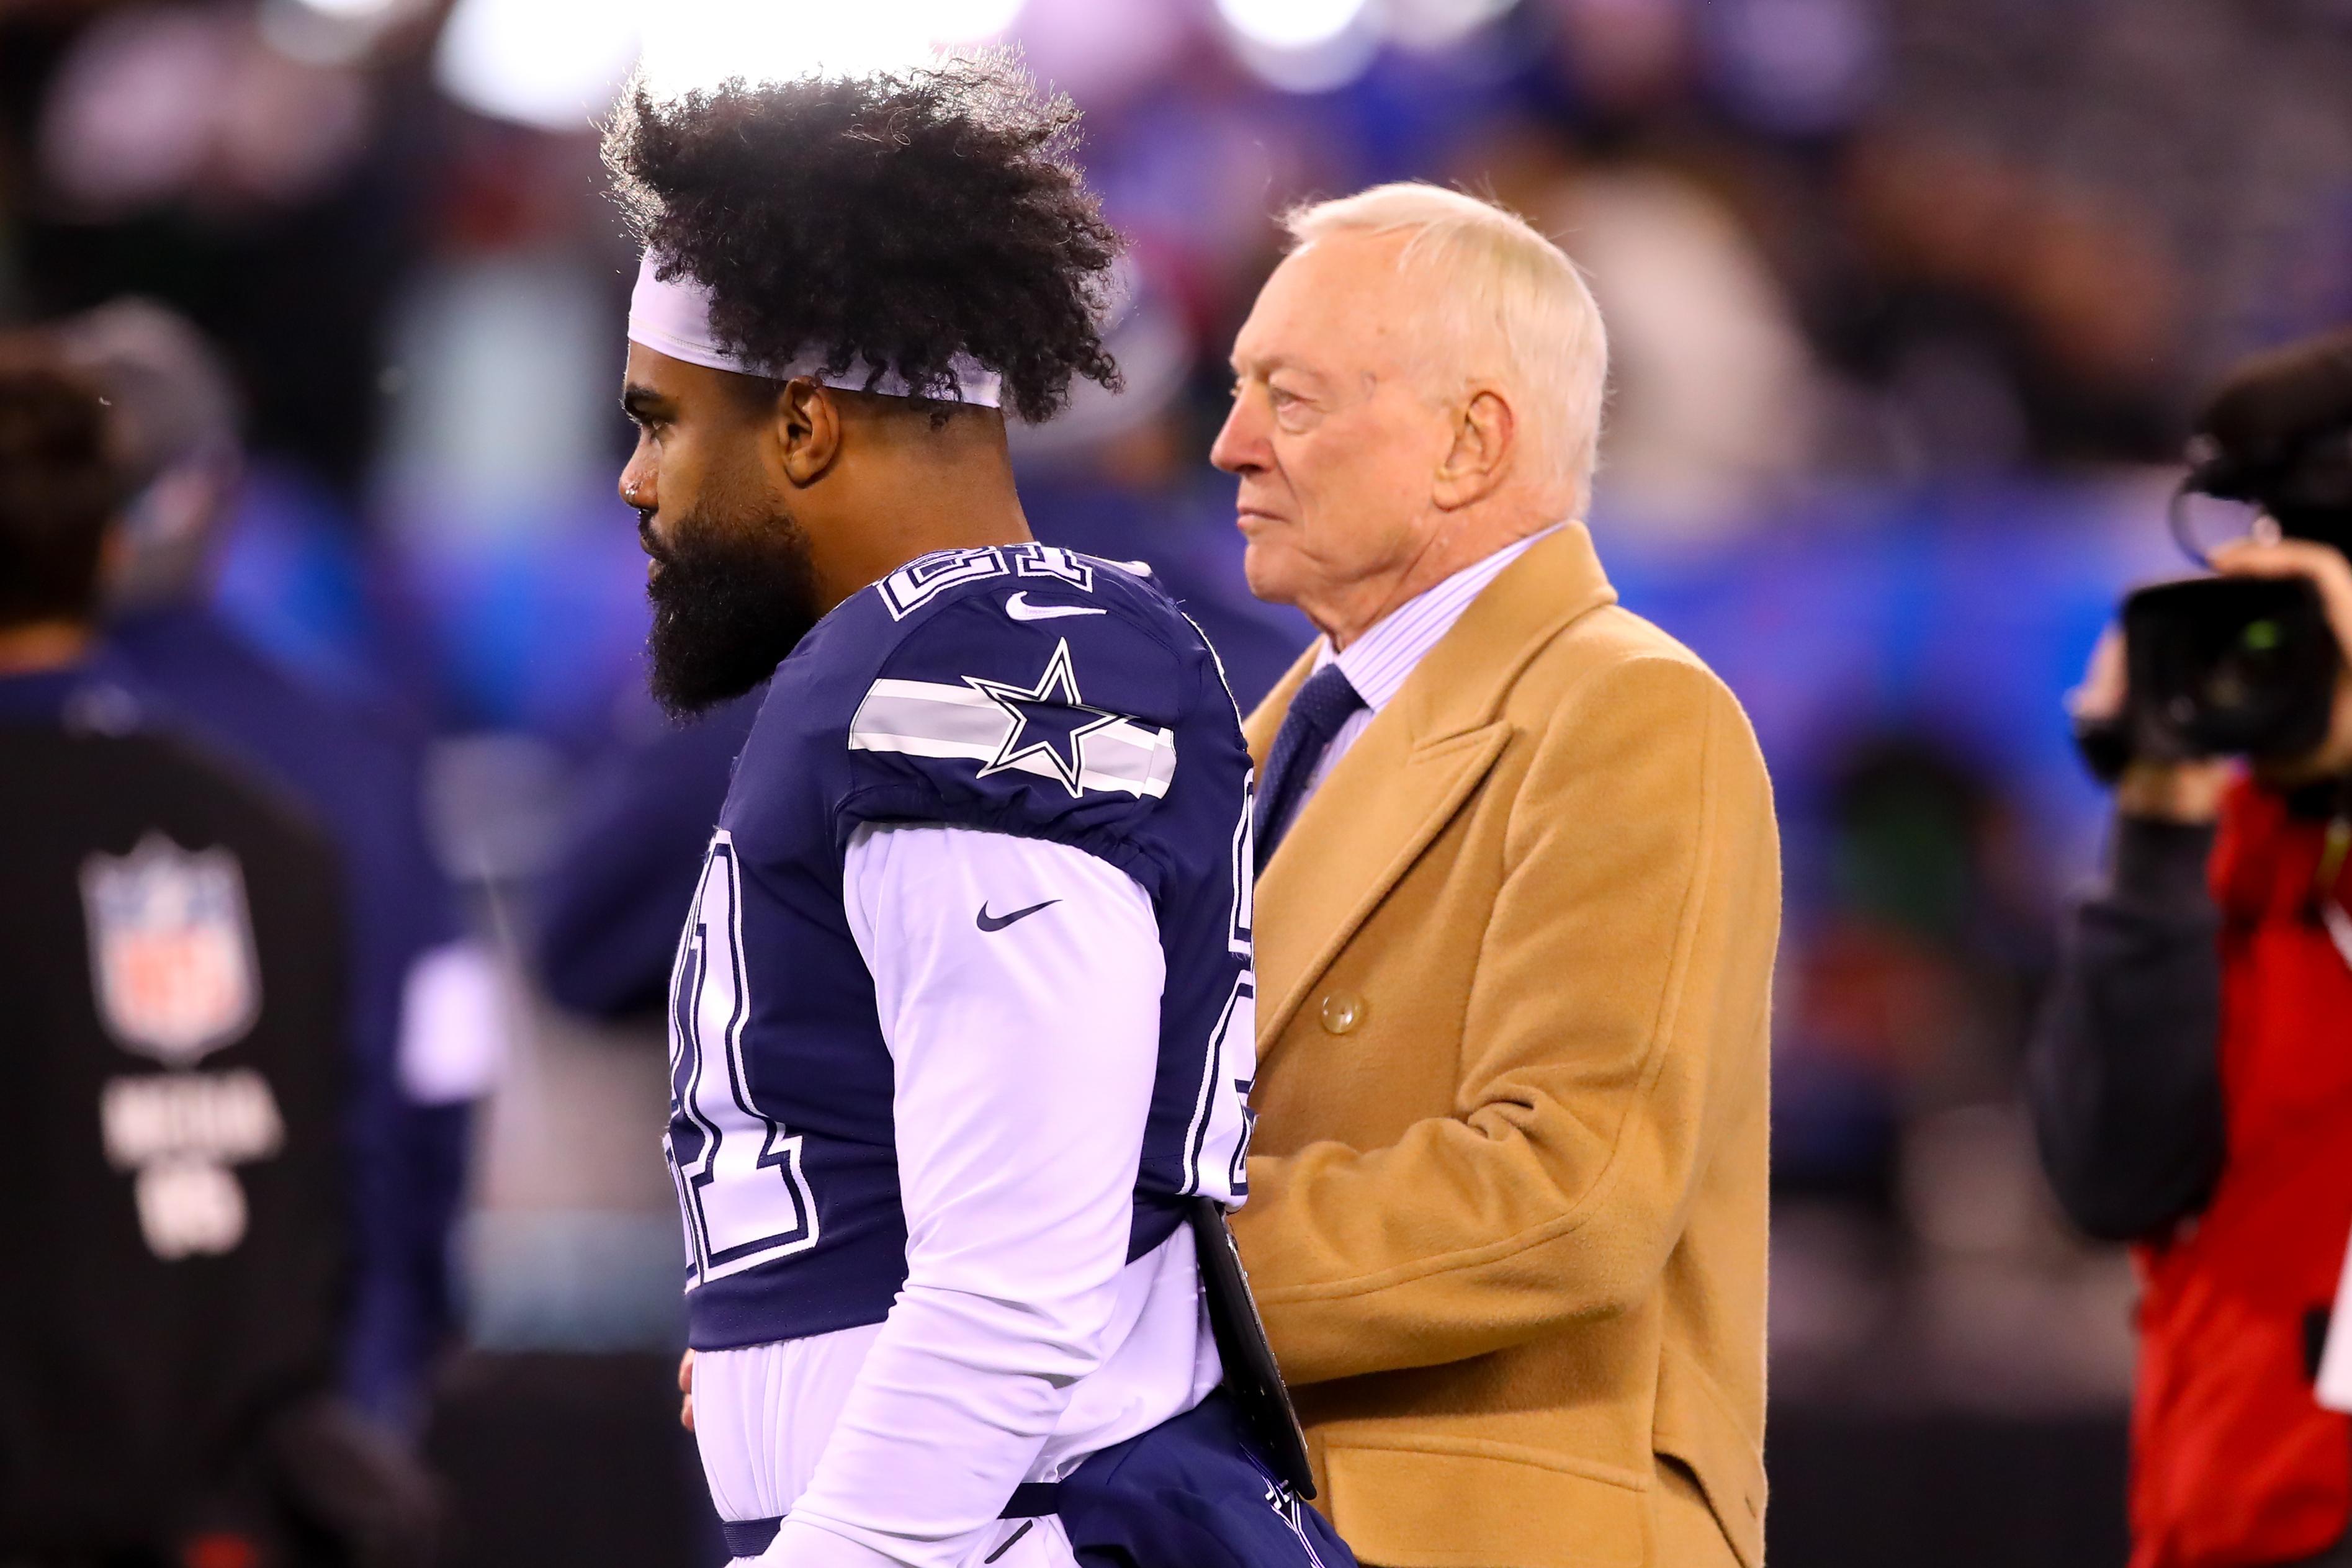 Cowboys Owner Jerry Jones talks with running back Ezekiel Elliott